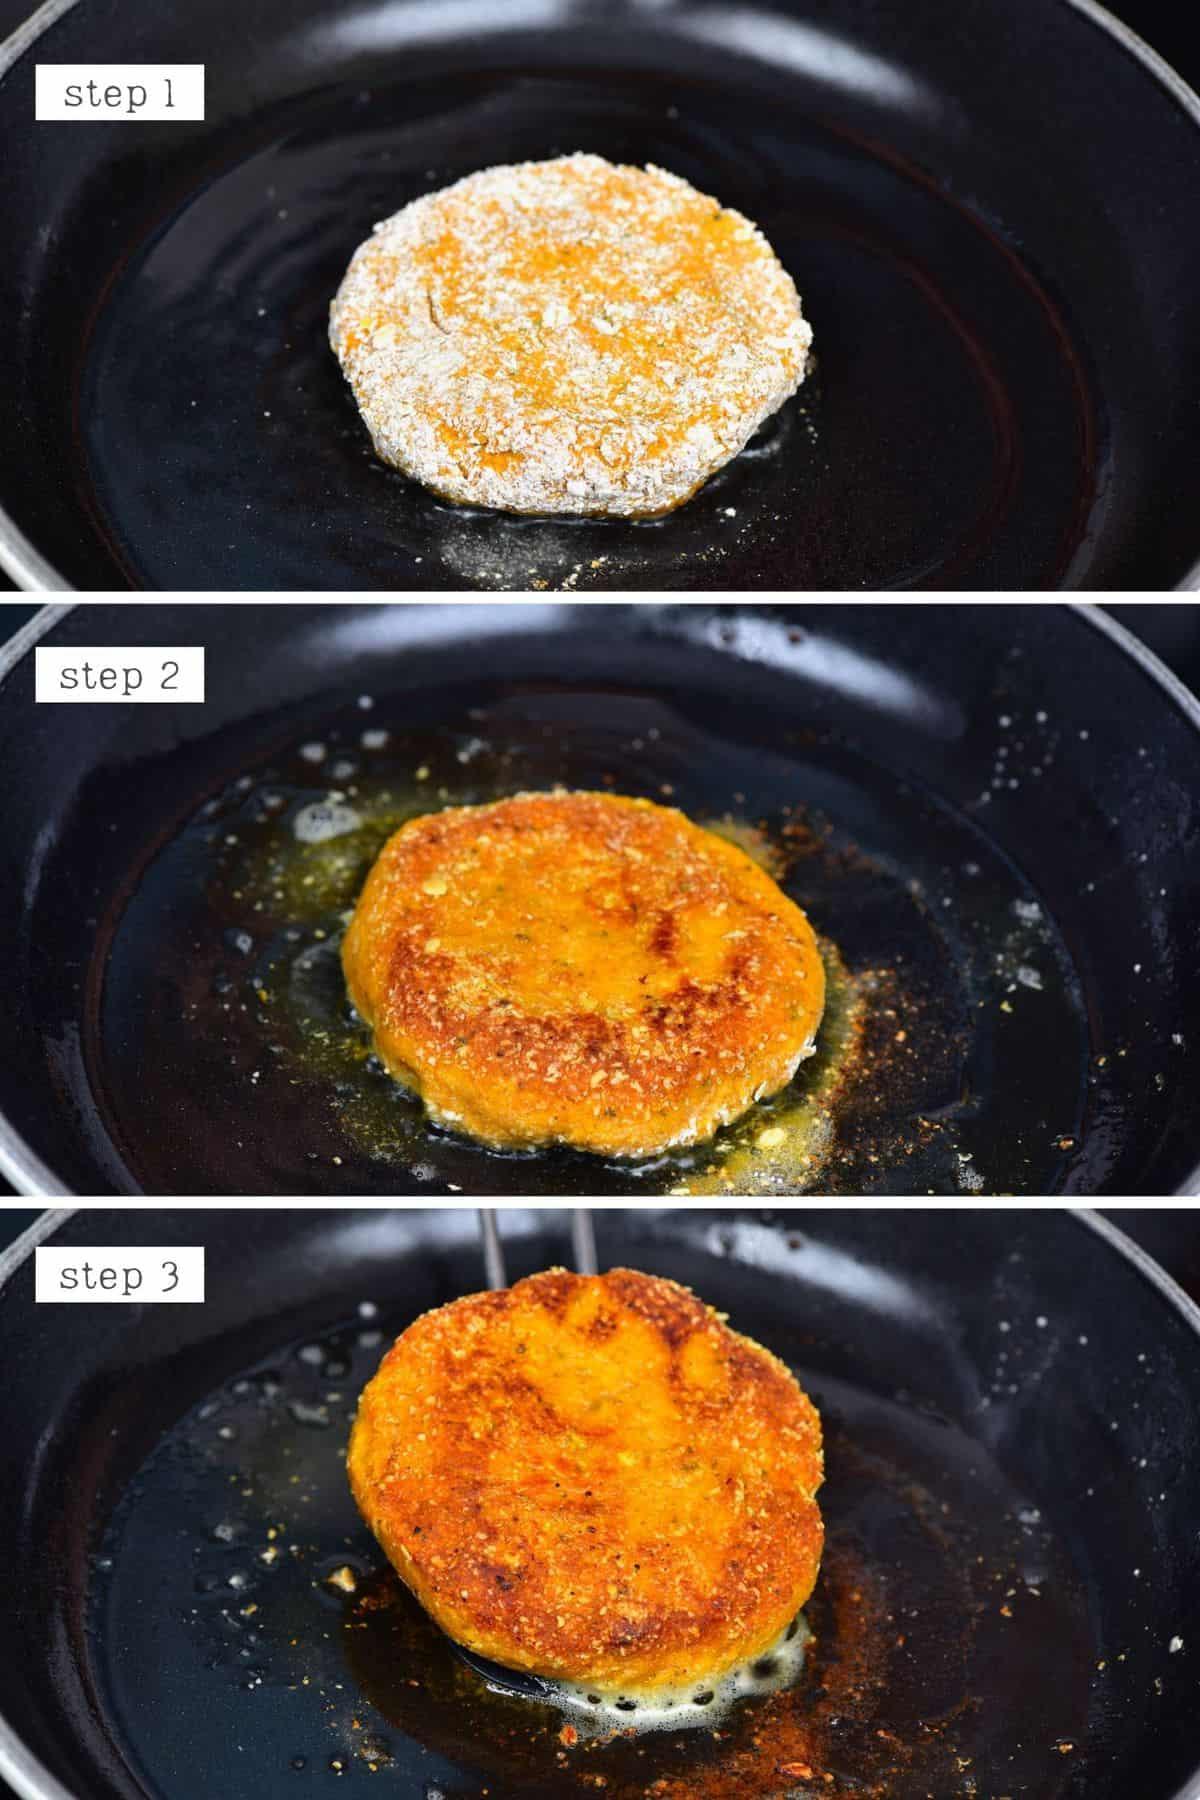 Steps for frying pumpkin patties